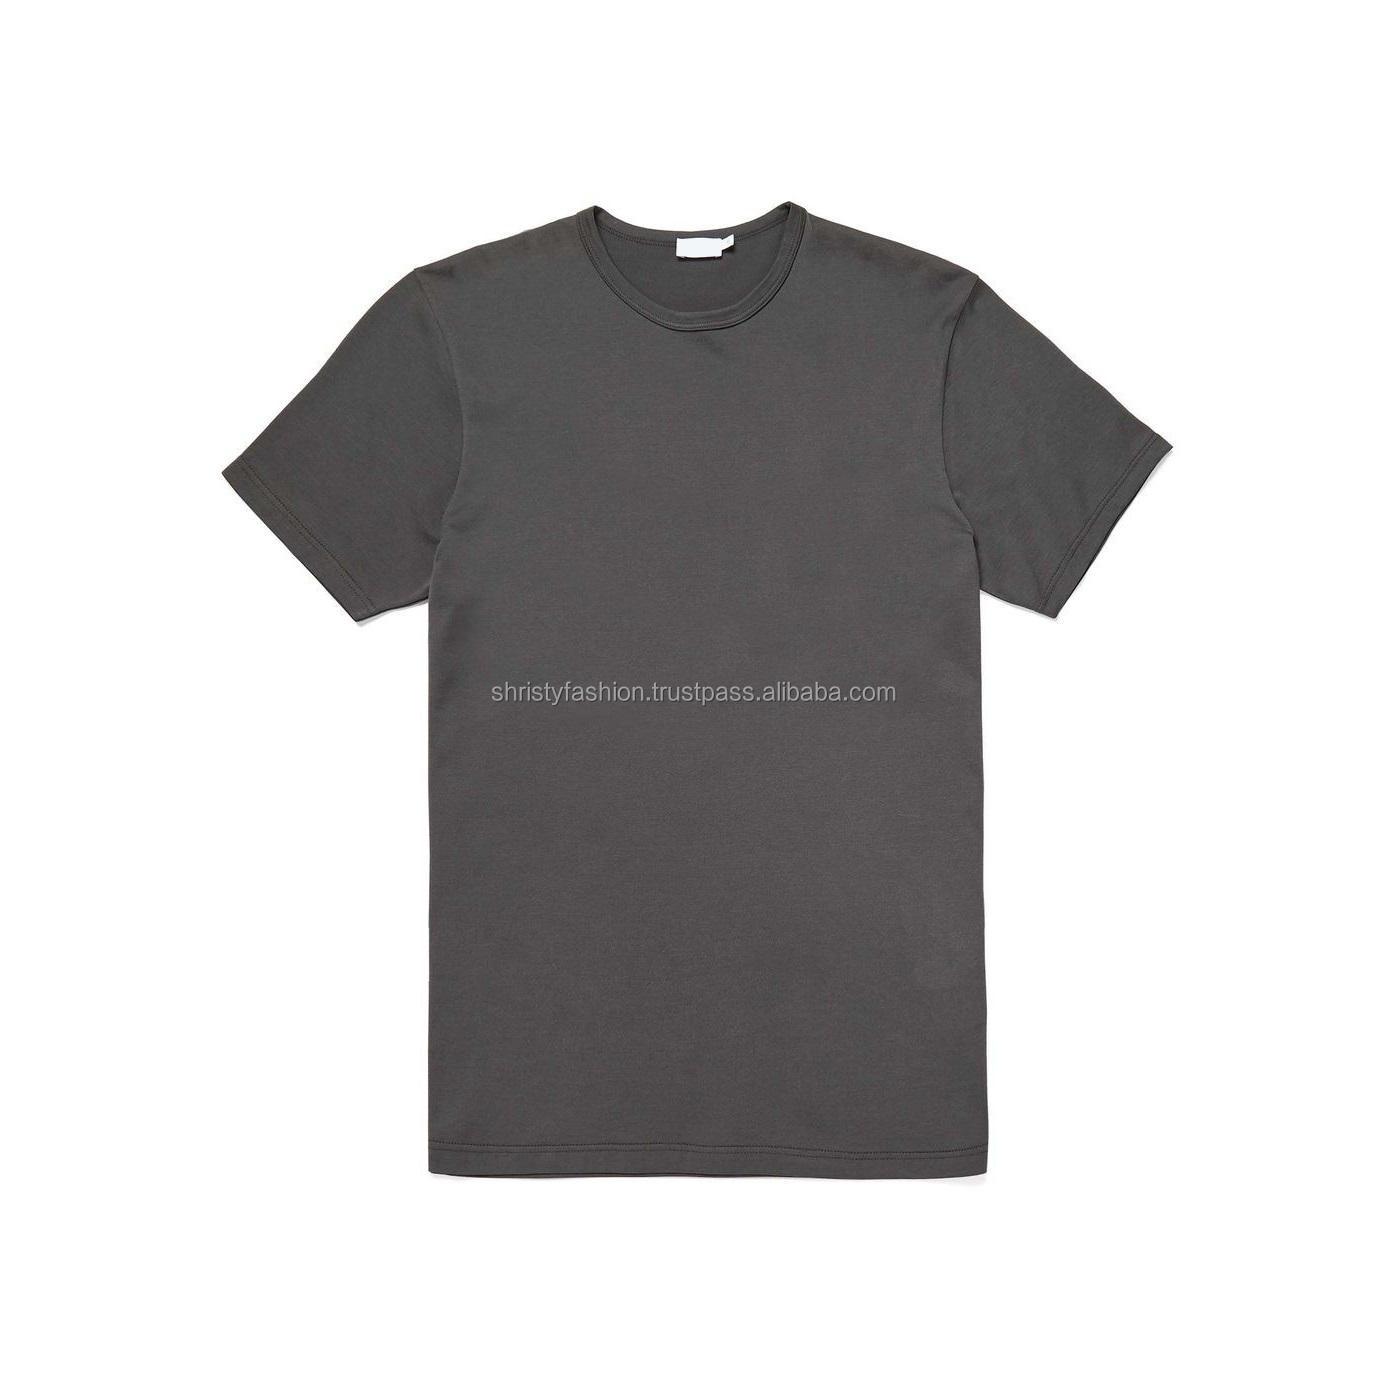 100% Cotton Men's Plain T Shirt From Bangladesh